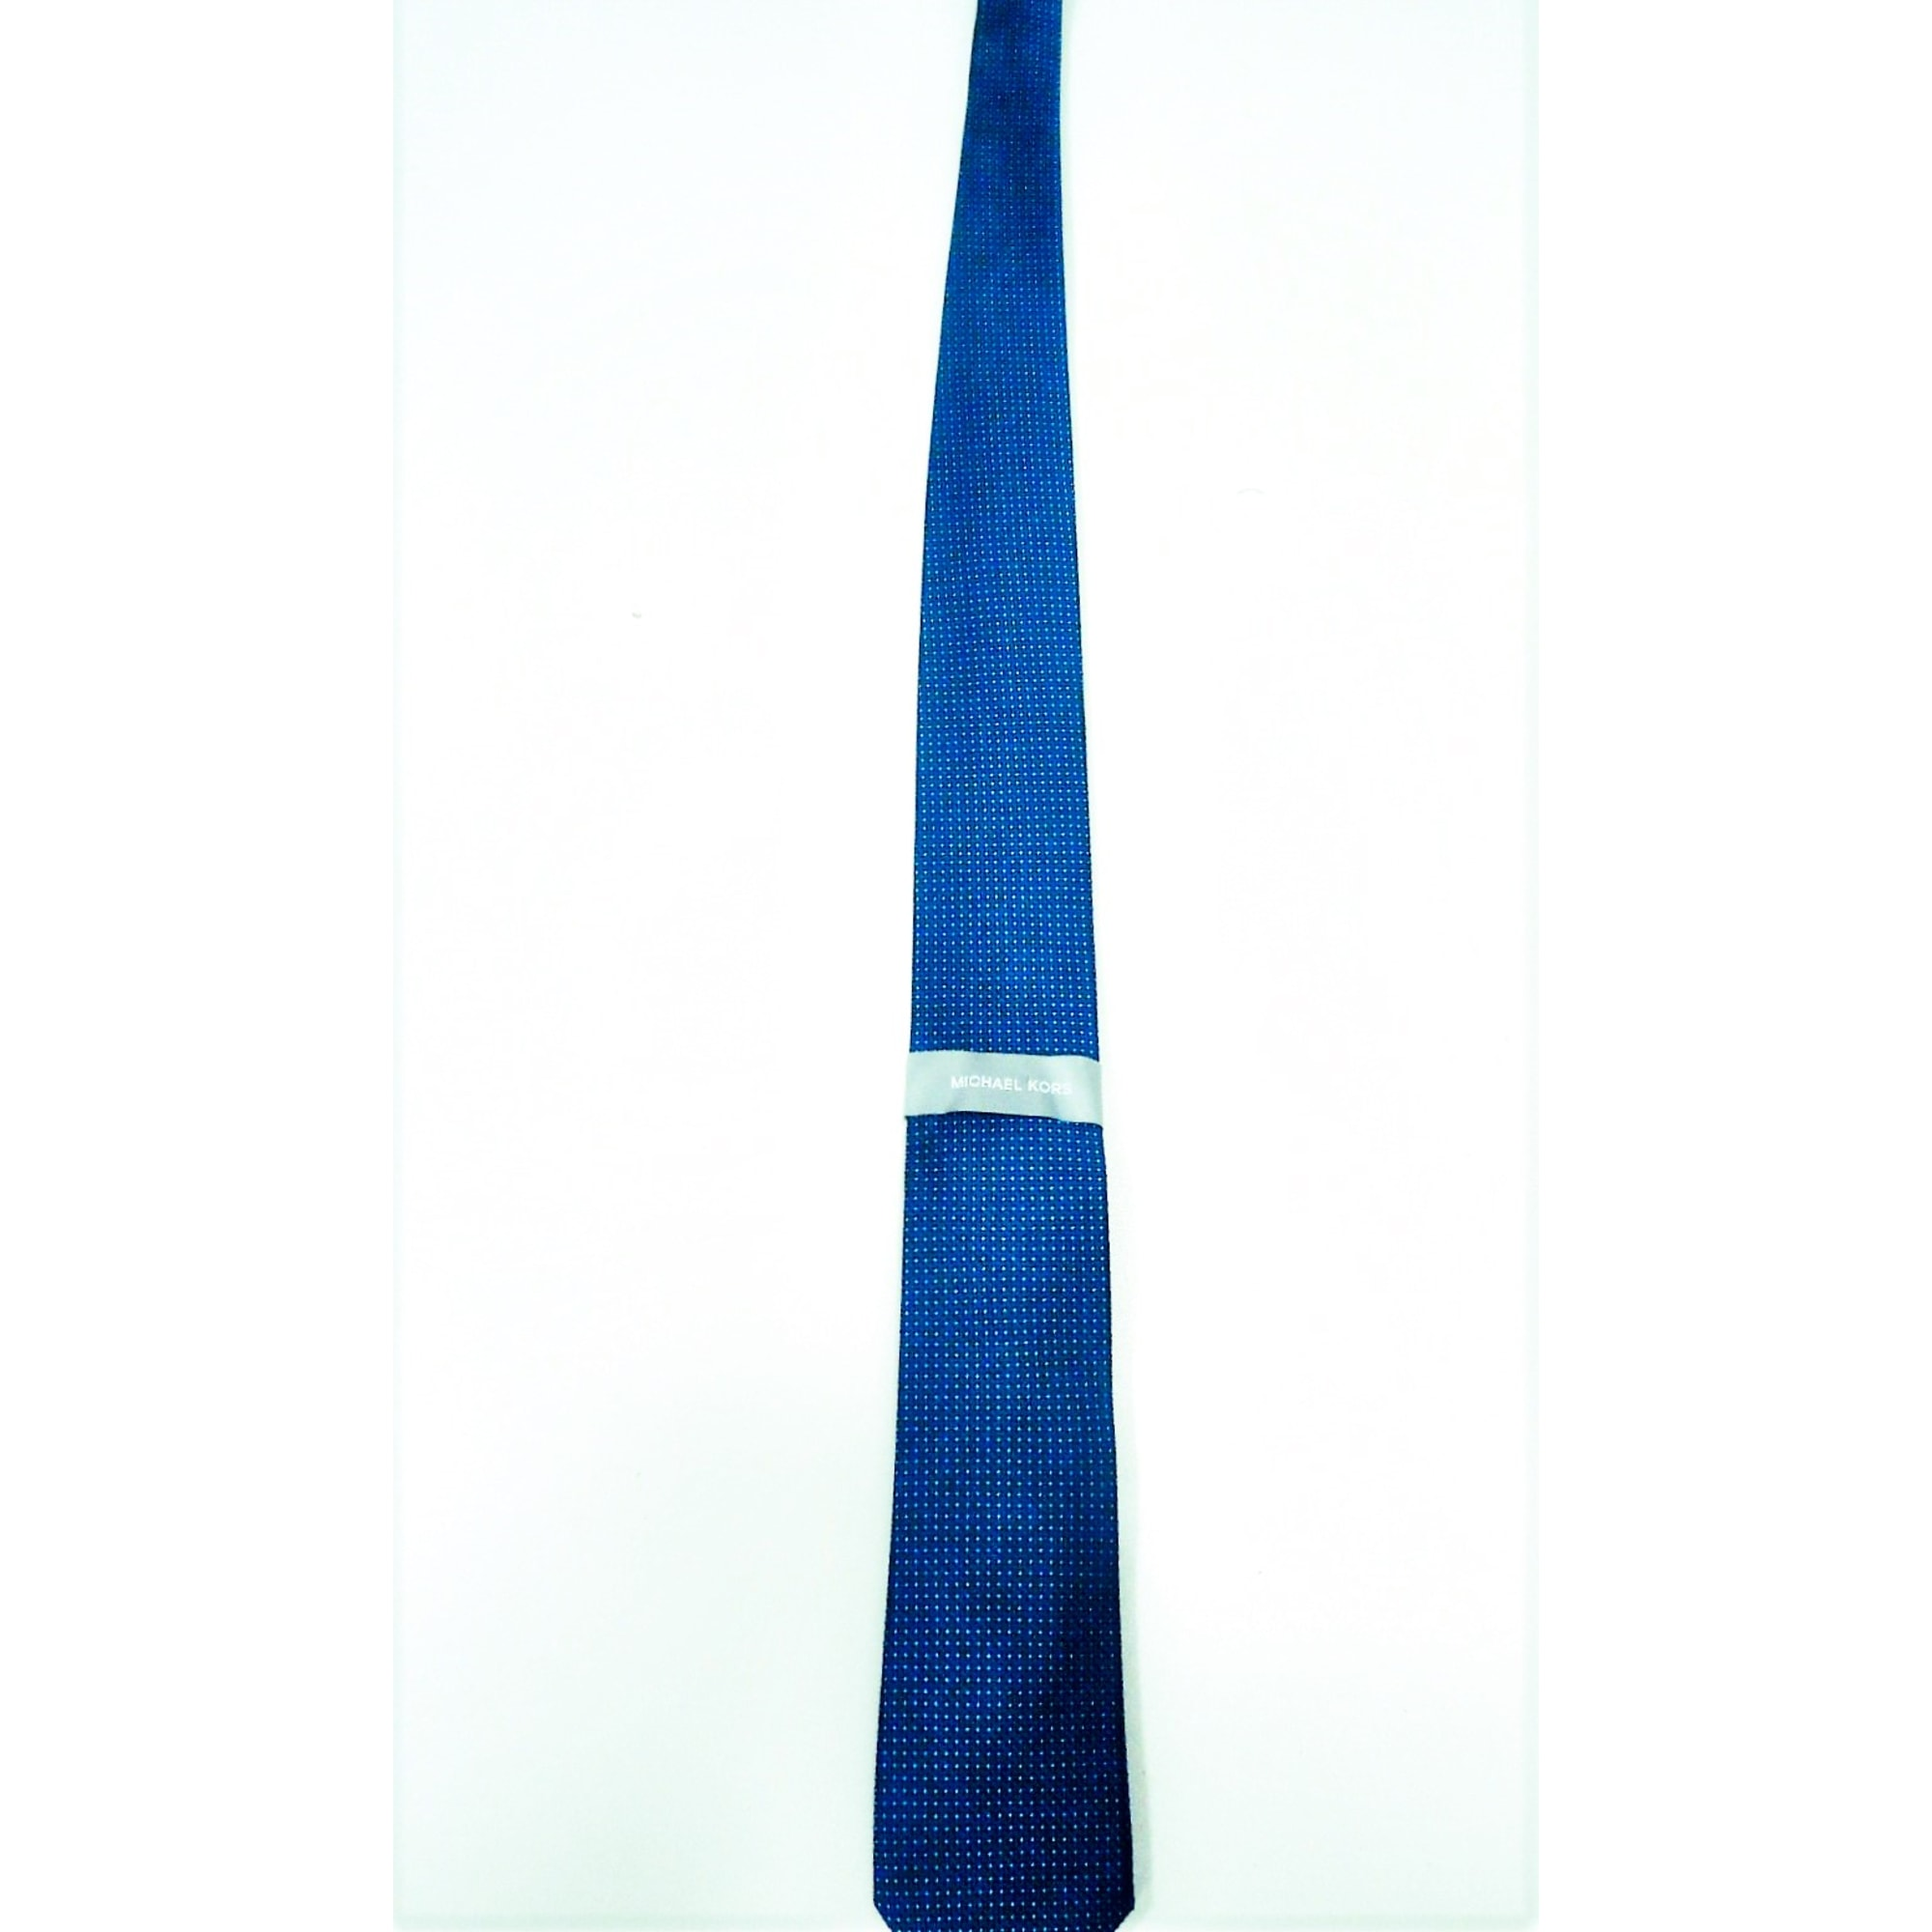 Cravate MICHAEL KORS Bleu, bleu marine, bleu turquoise